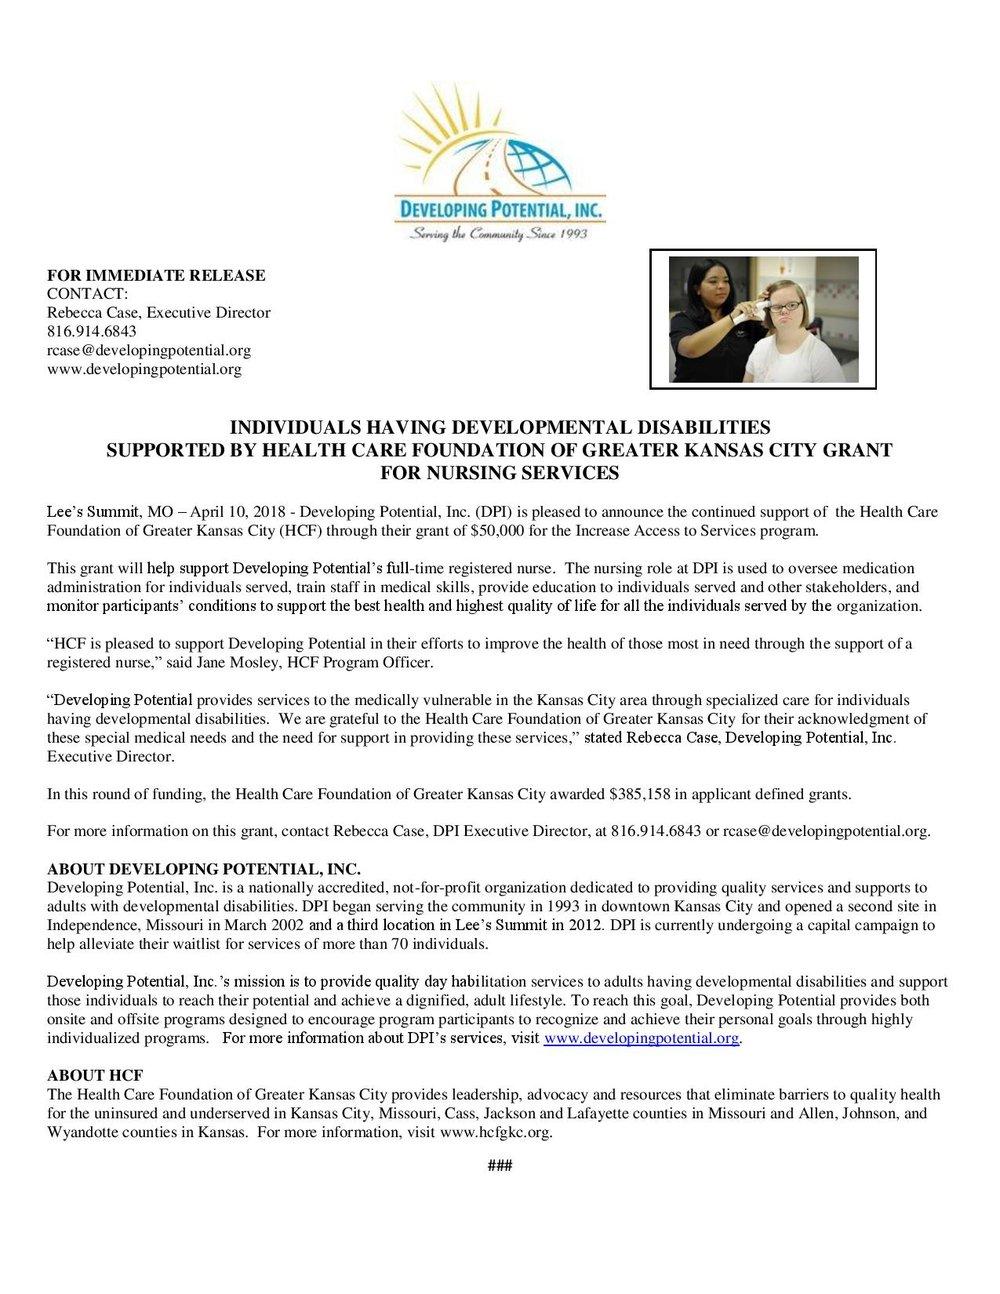 HCF grant press release April 2018-page-001.jpg